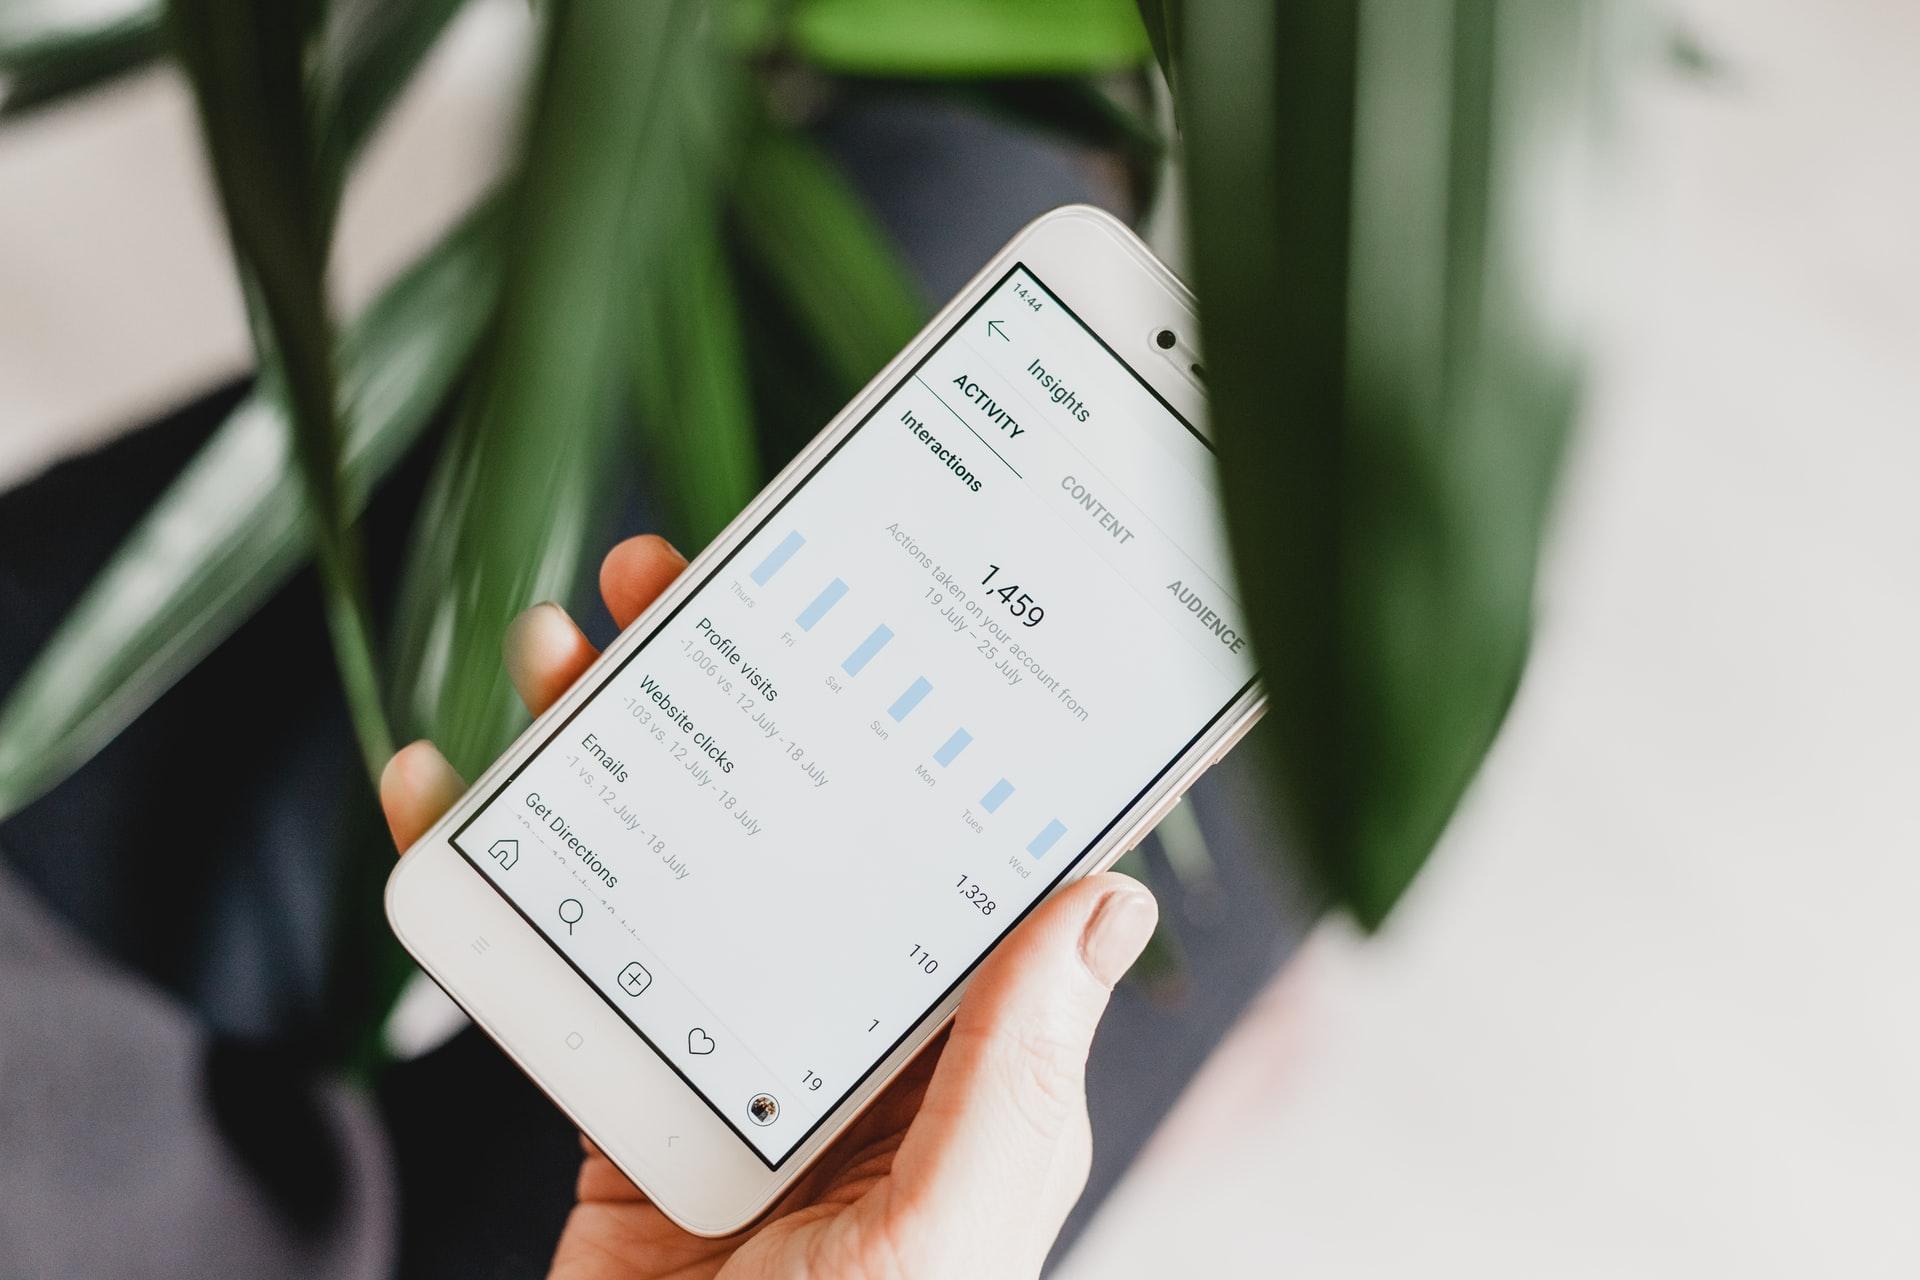 Phone showing Instagram analytics